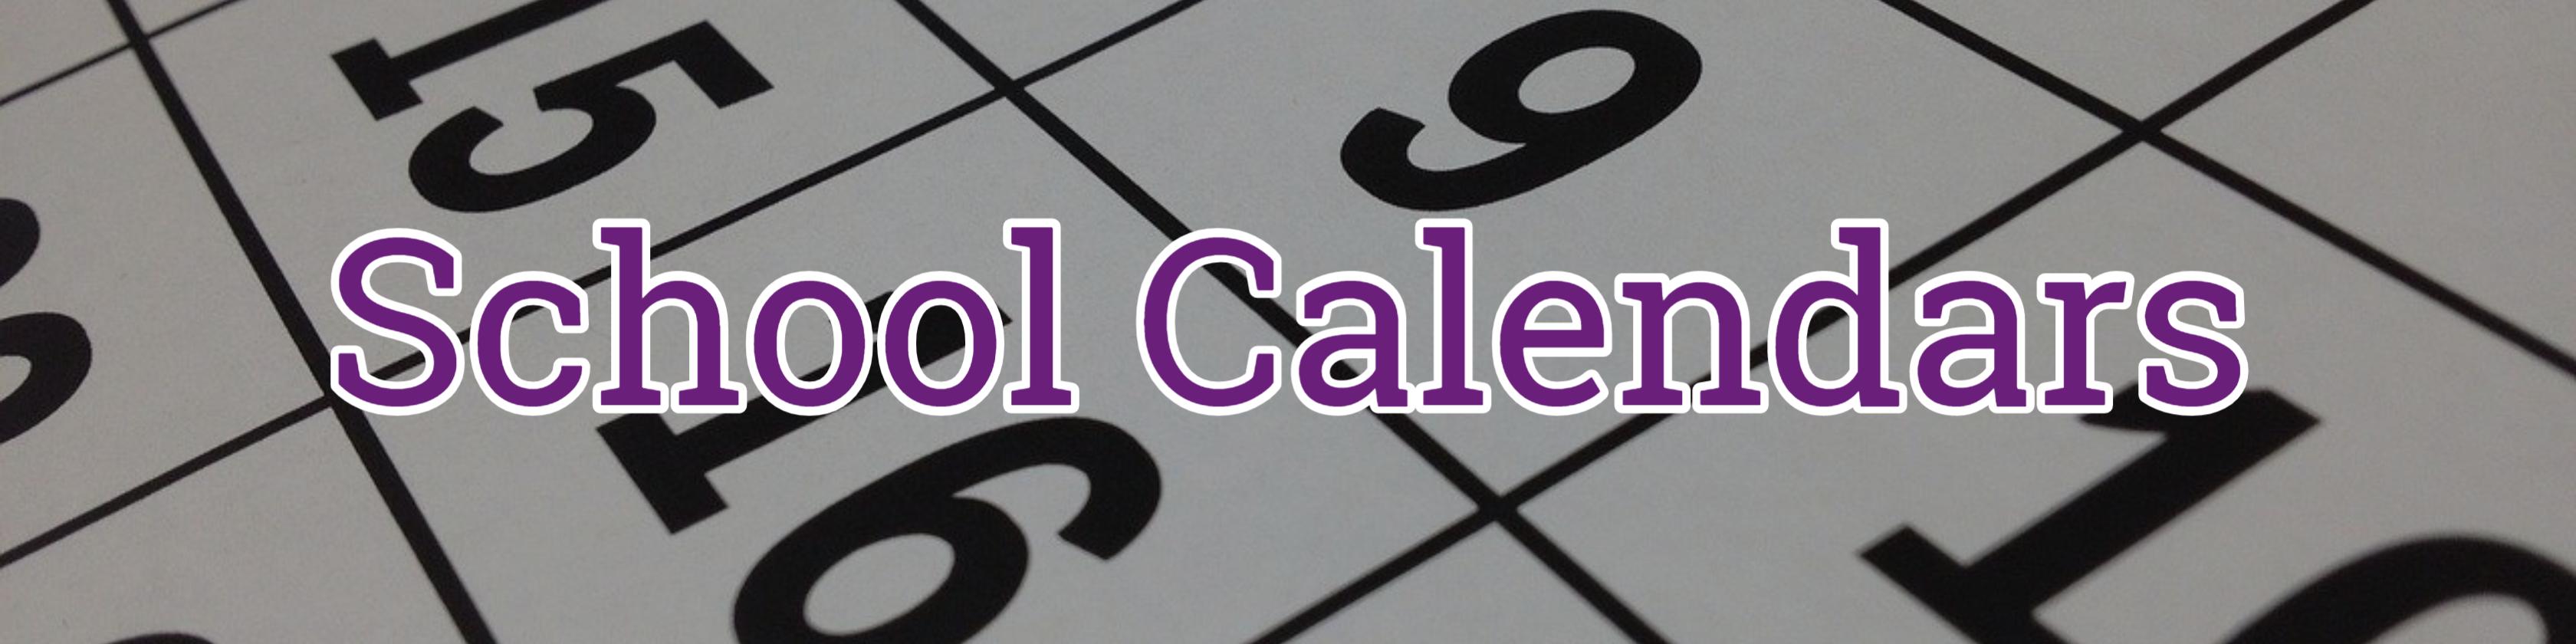 School Calendars Header